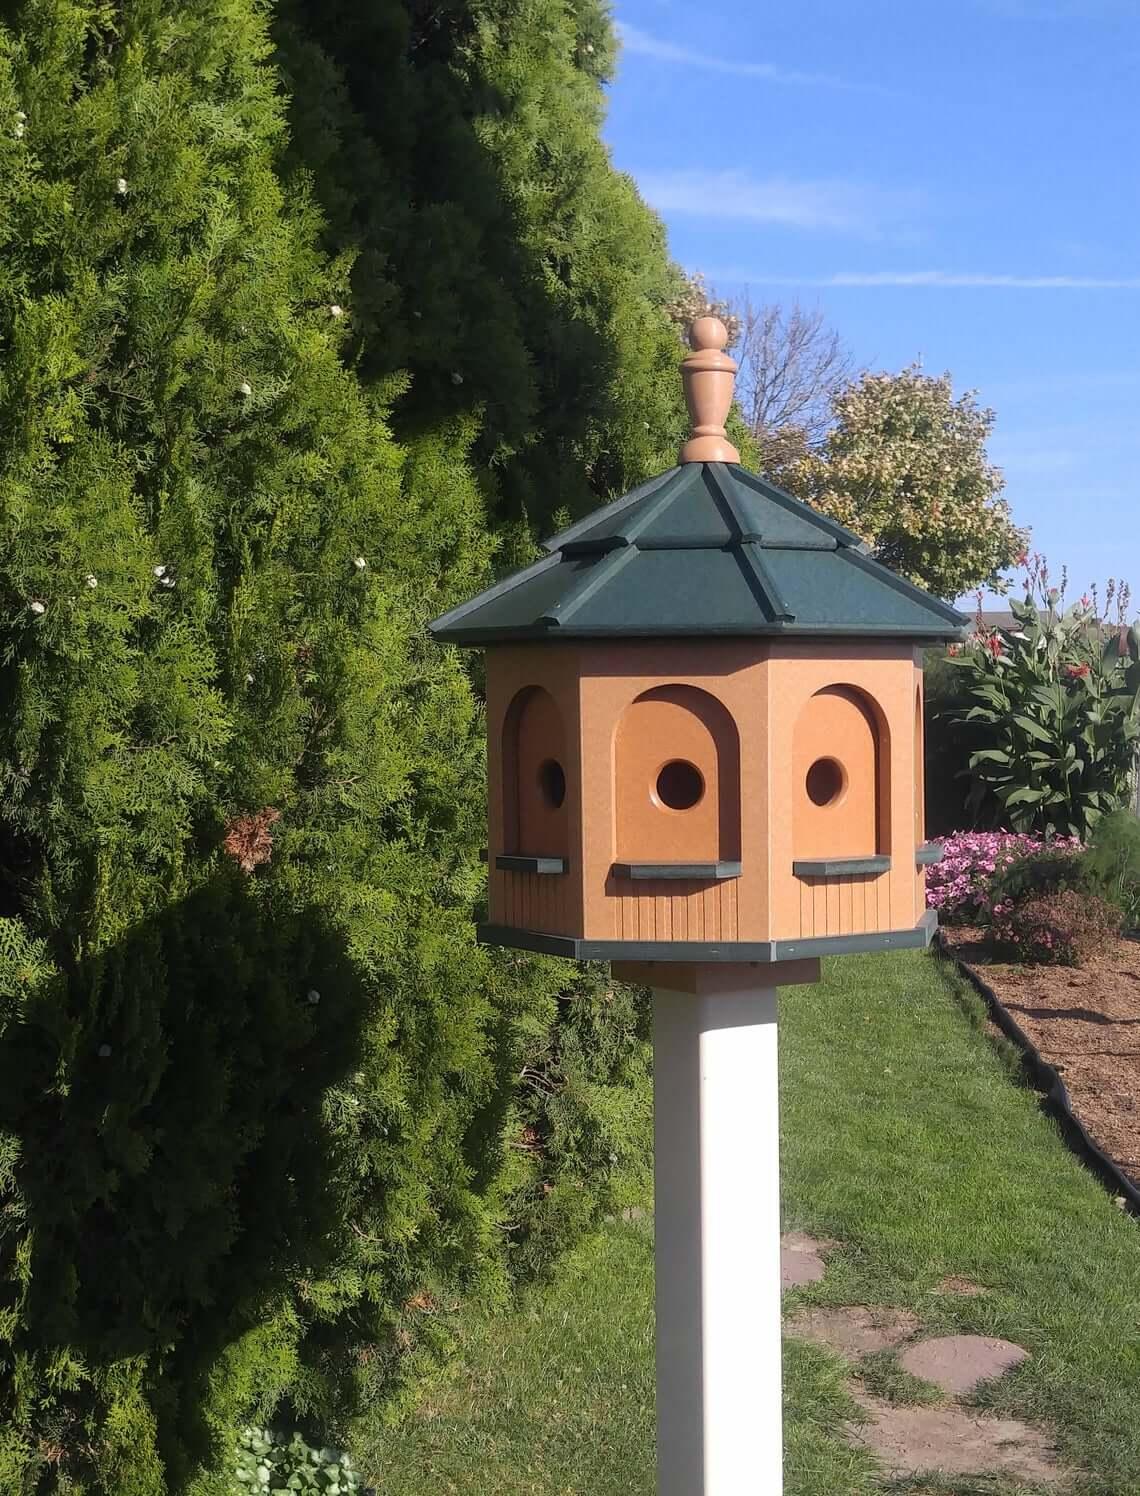 Extra Large Eight-Room Octagon Birdhouse